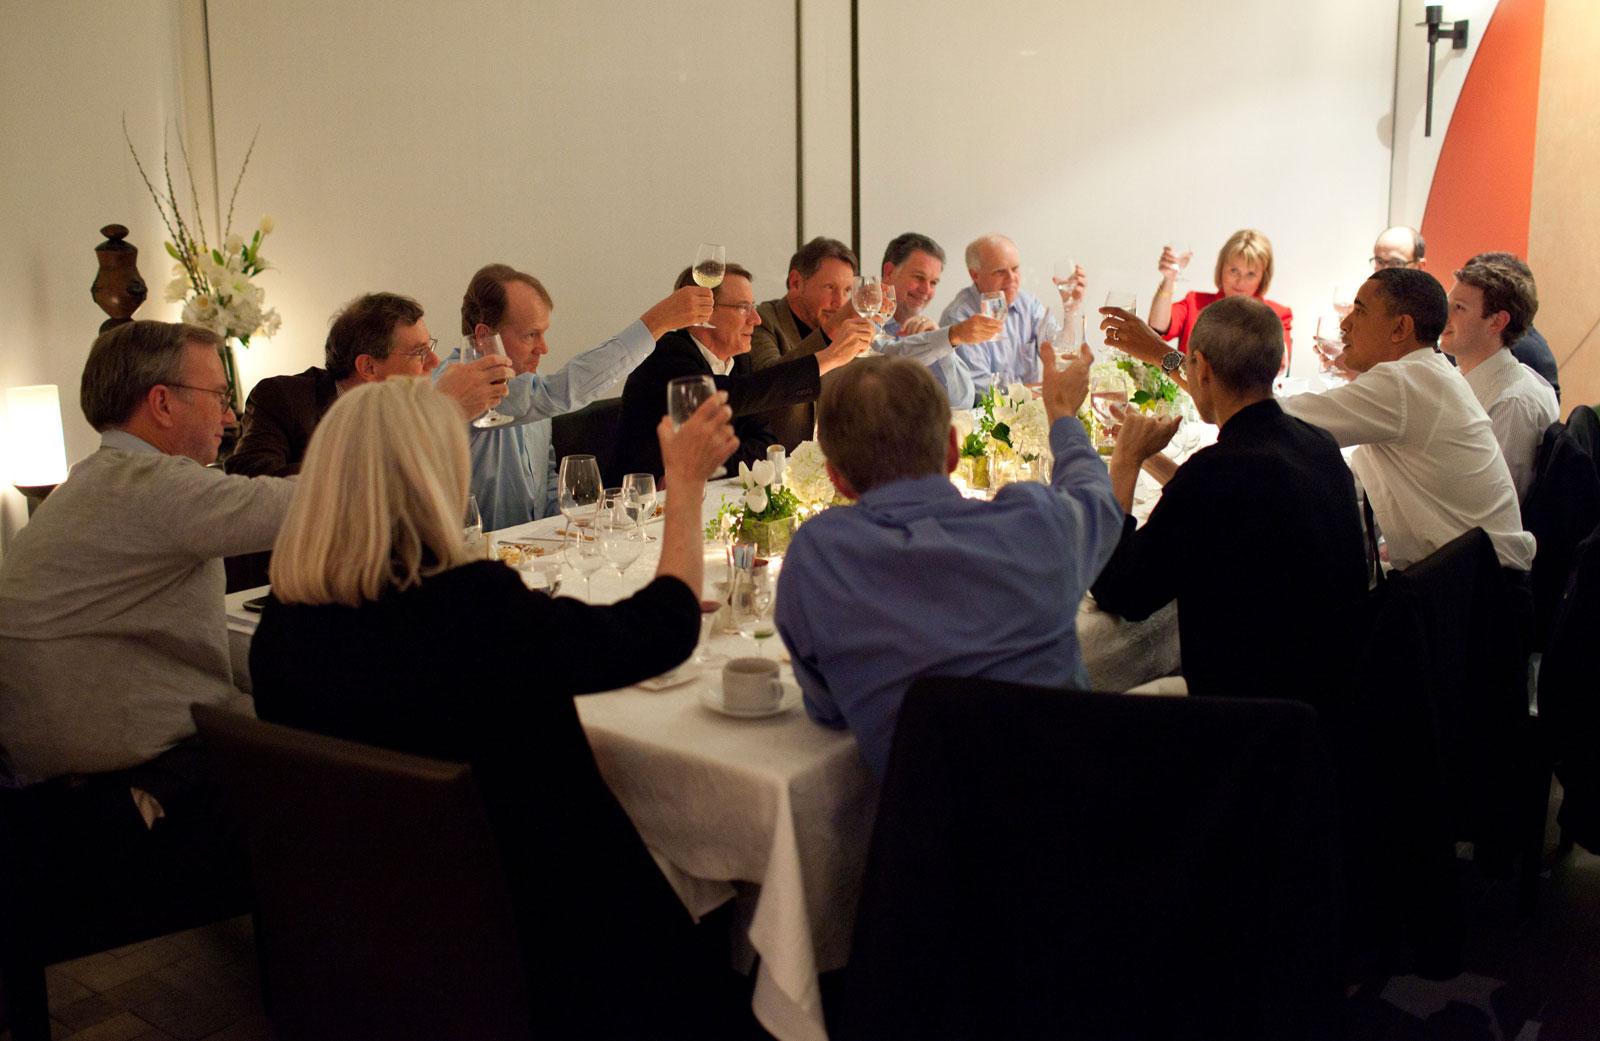 Obama's $1 trillion Silicon Valley Dinner